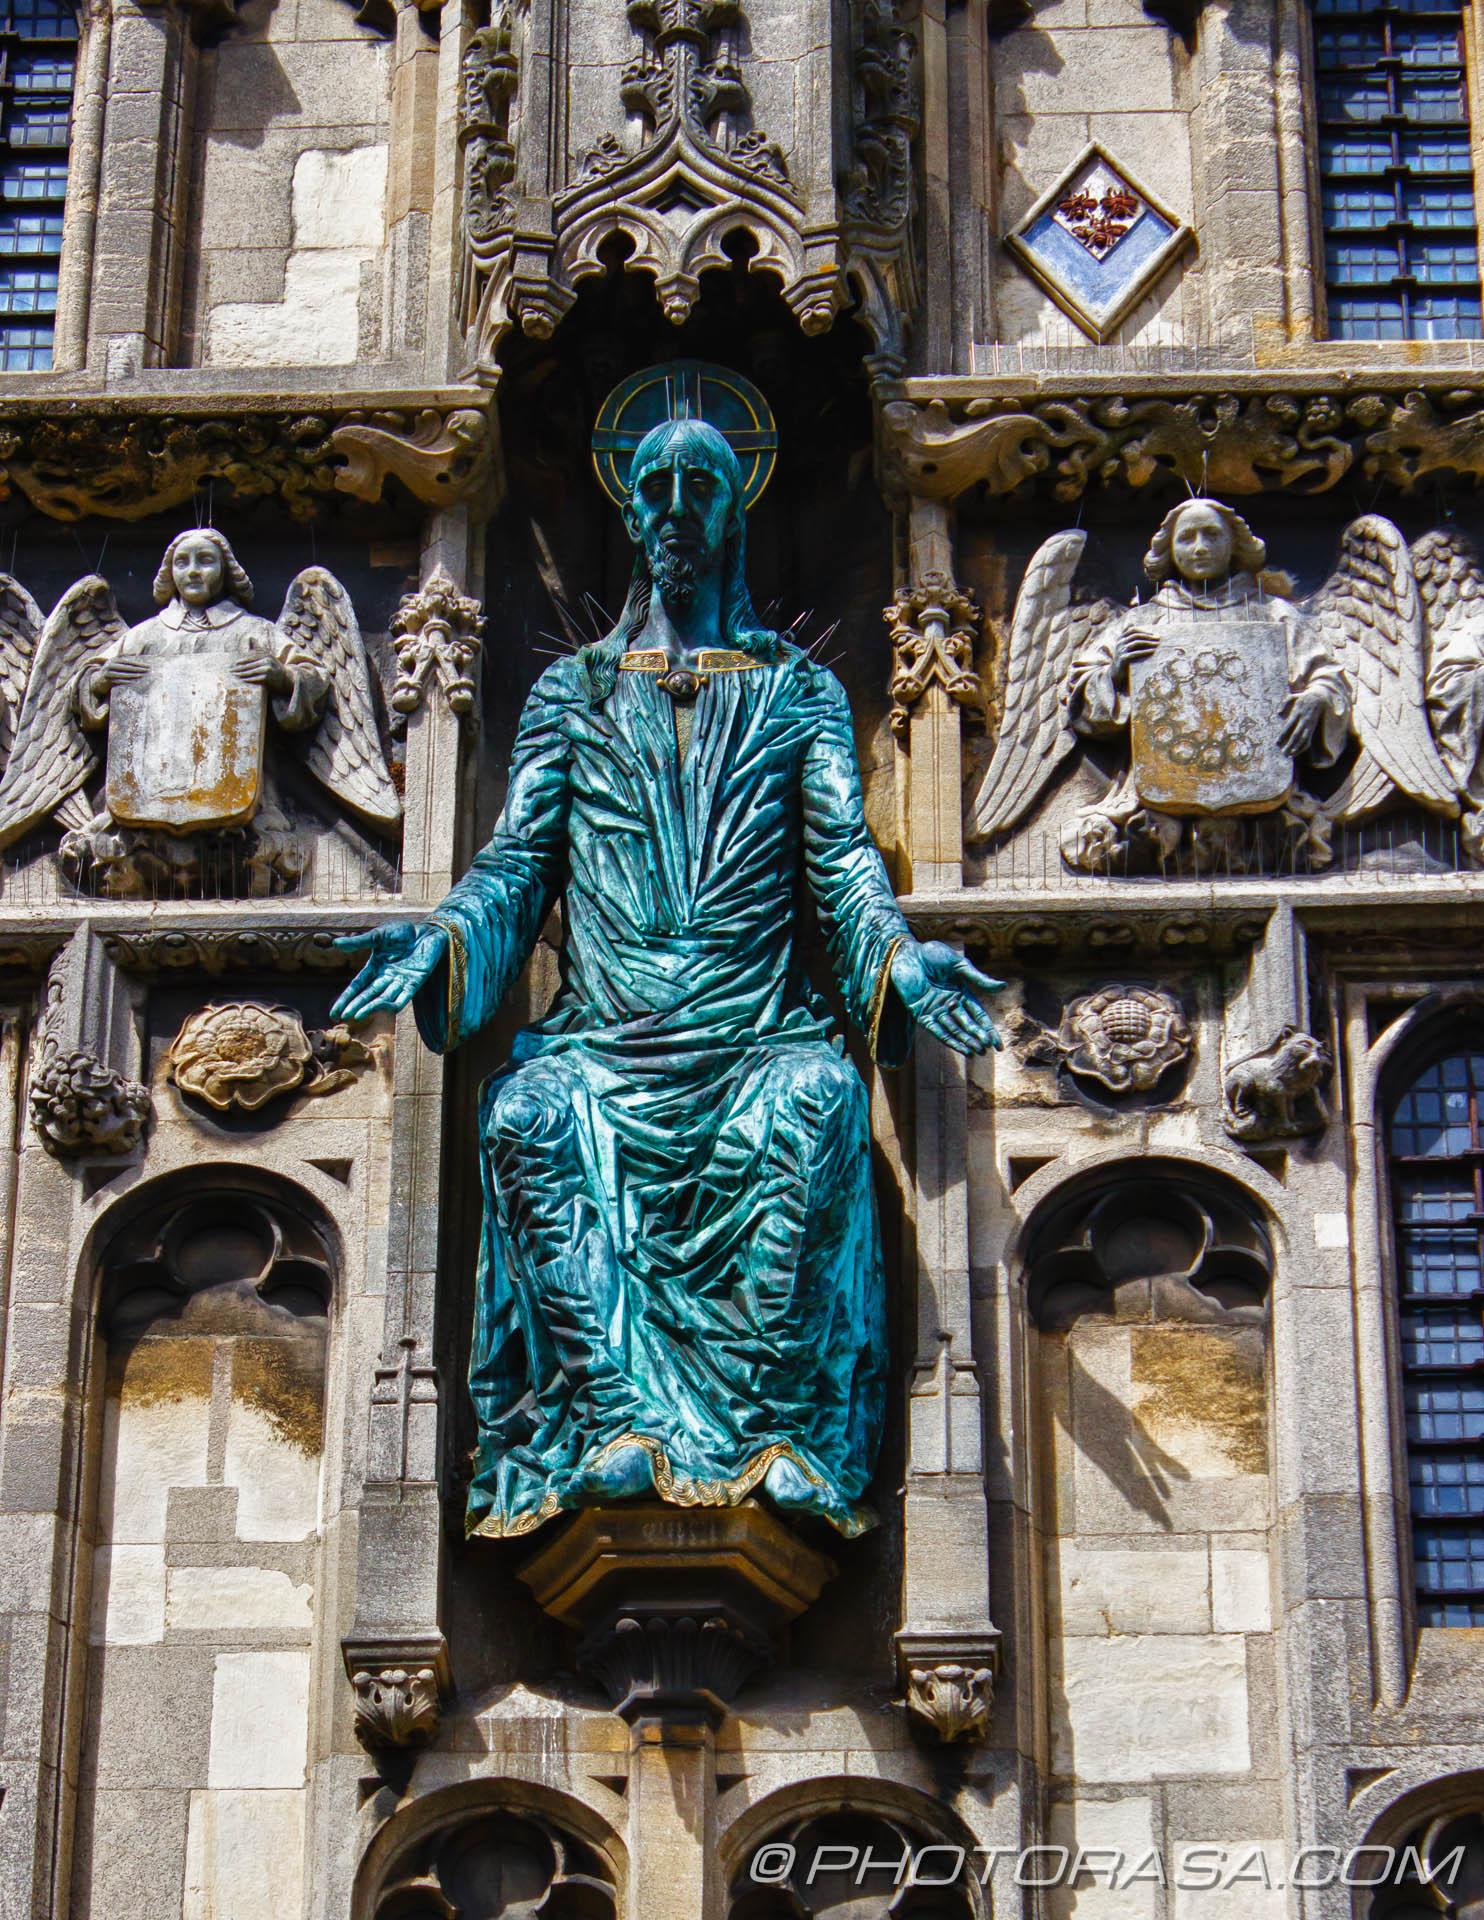 http://photorasa.com/canterbury-trip/jesus-above-catherdral-entrance/